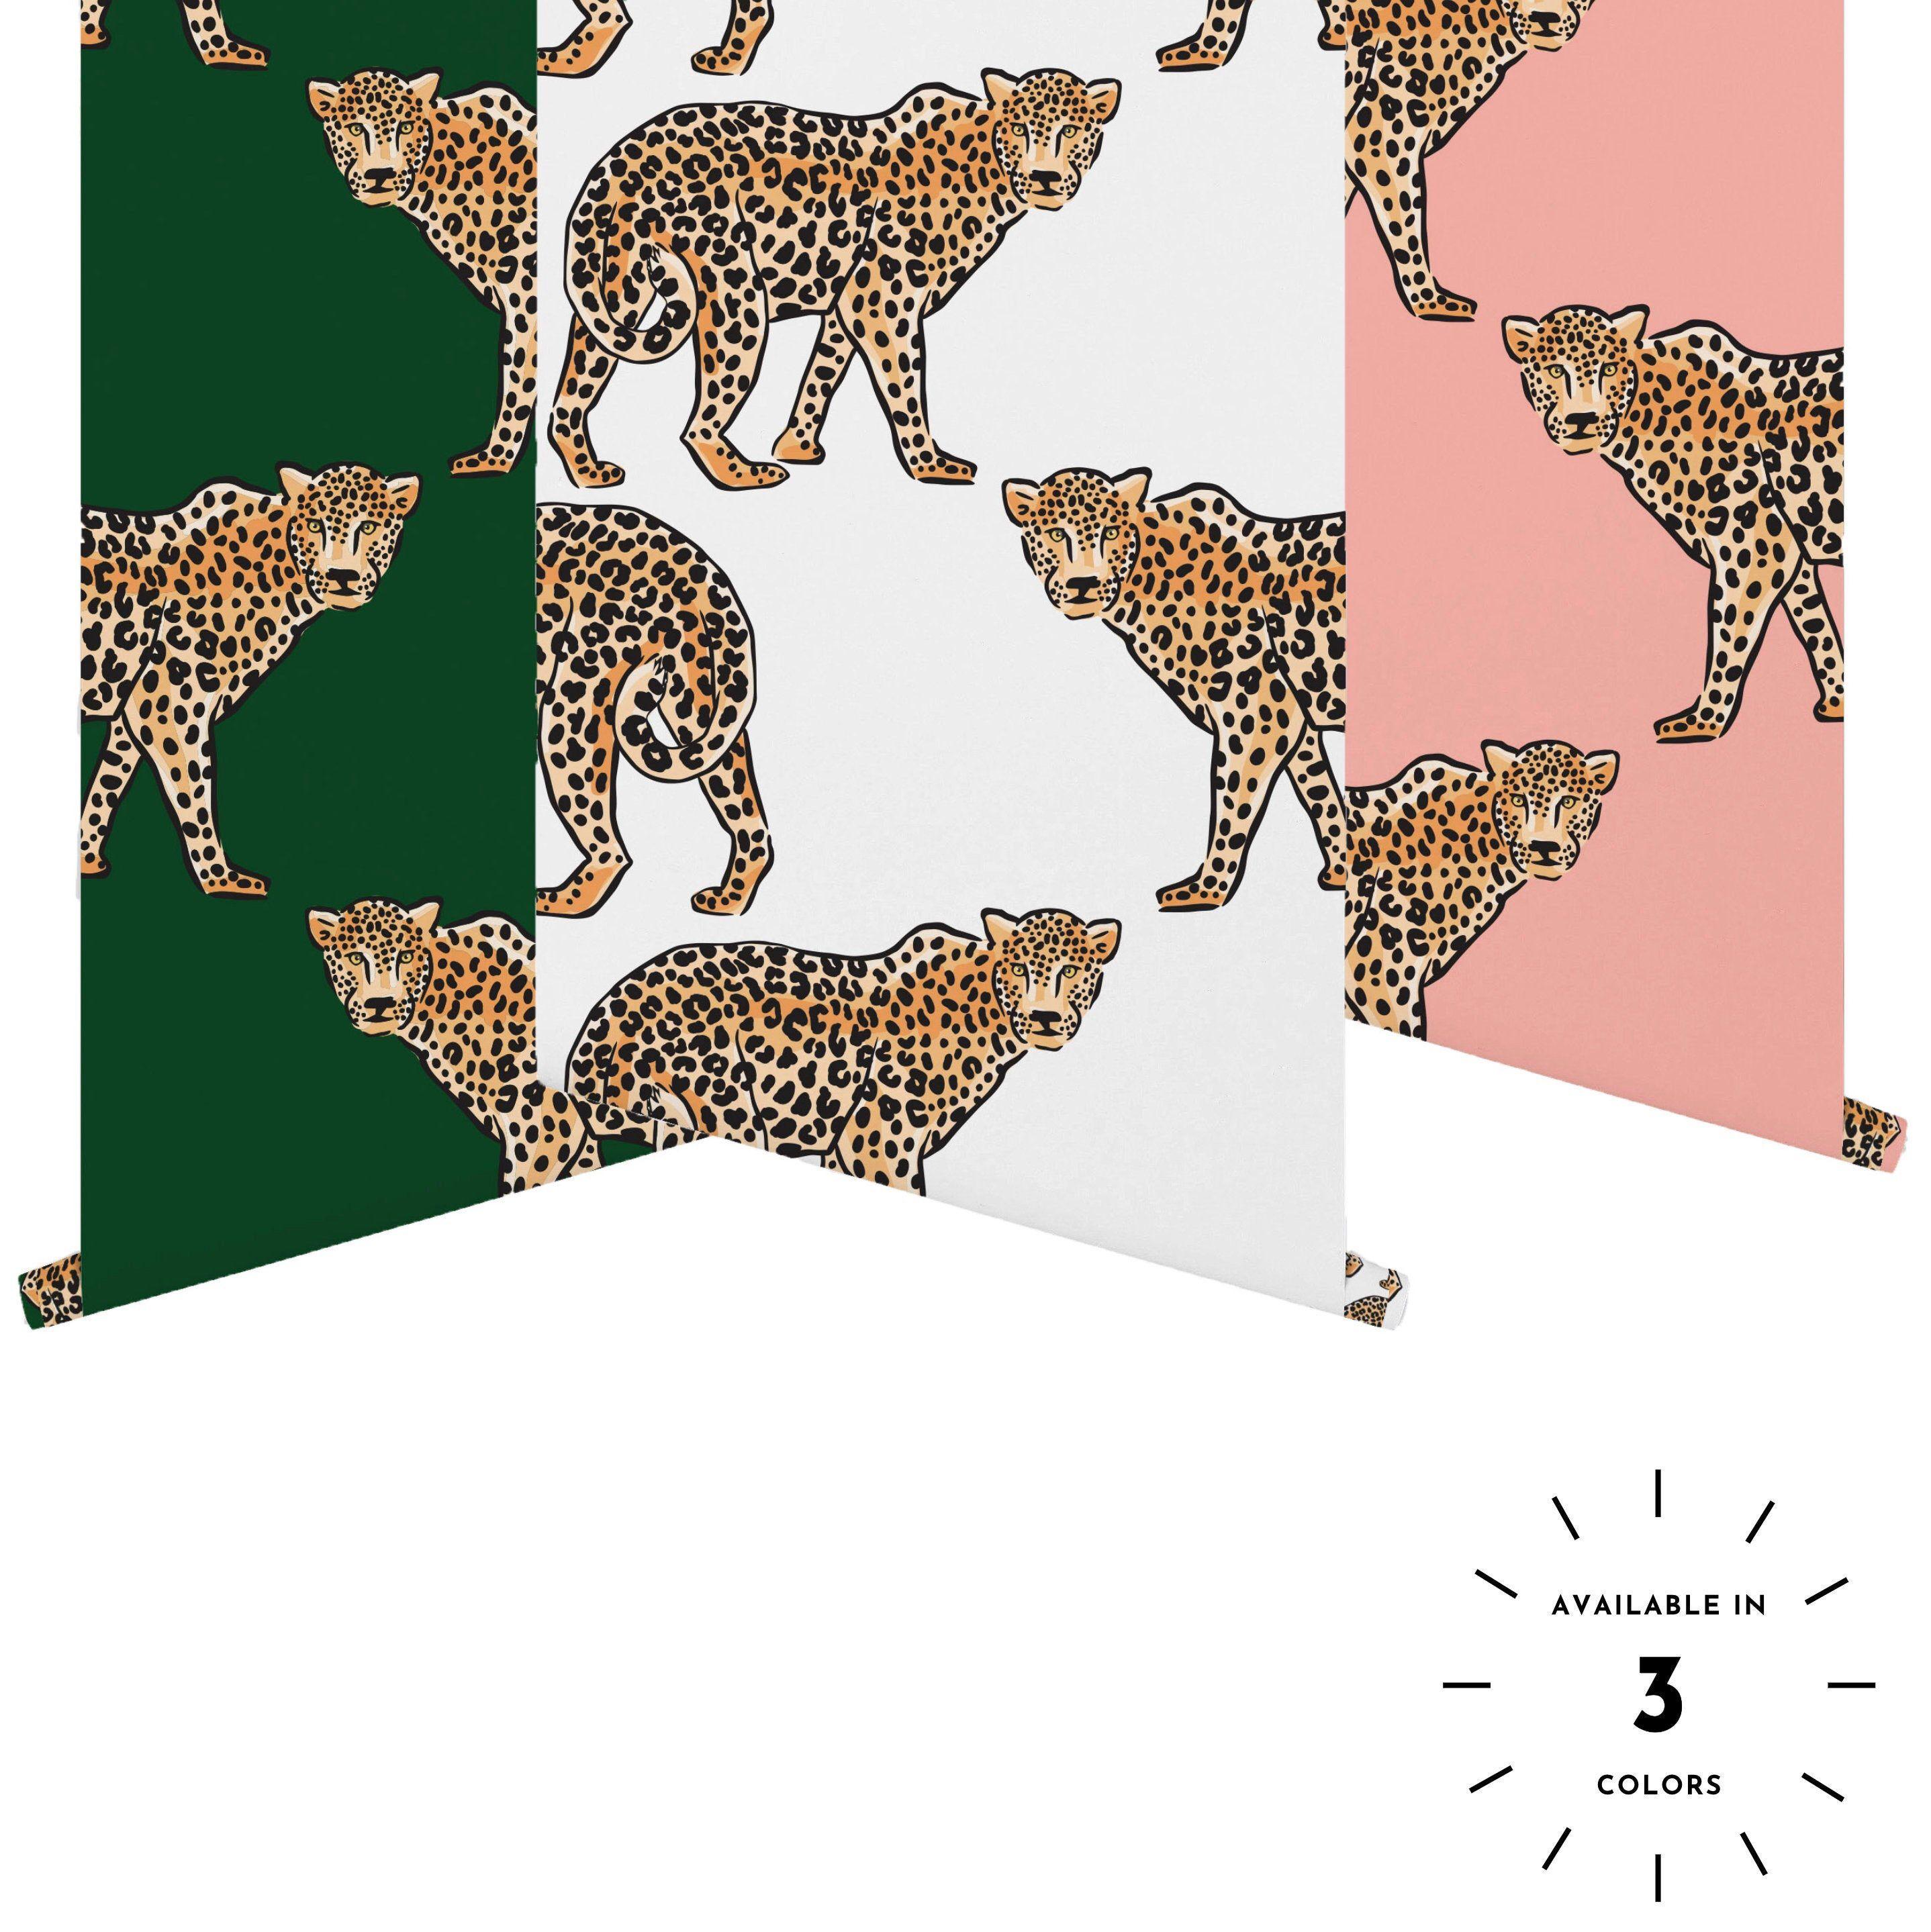 Jungle Leopard Removable Wallpaper Tropical Removable